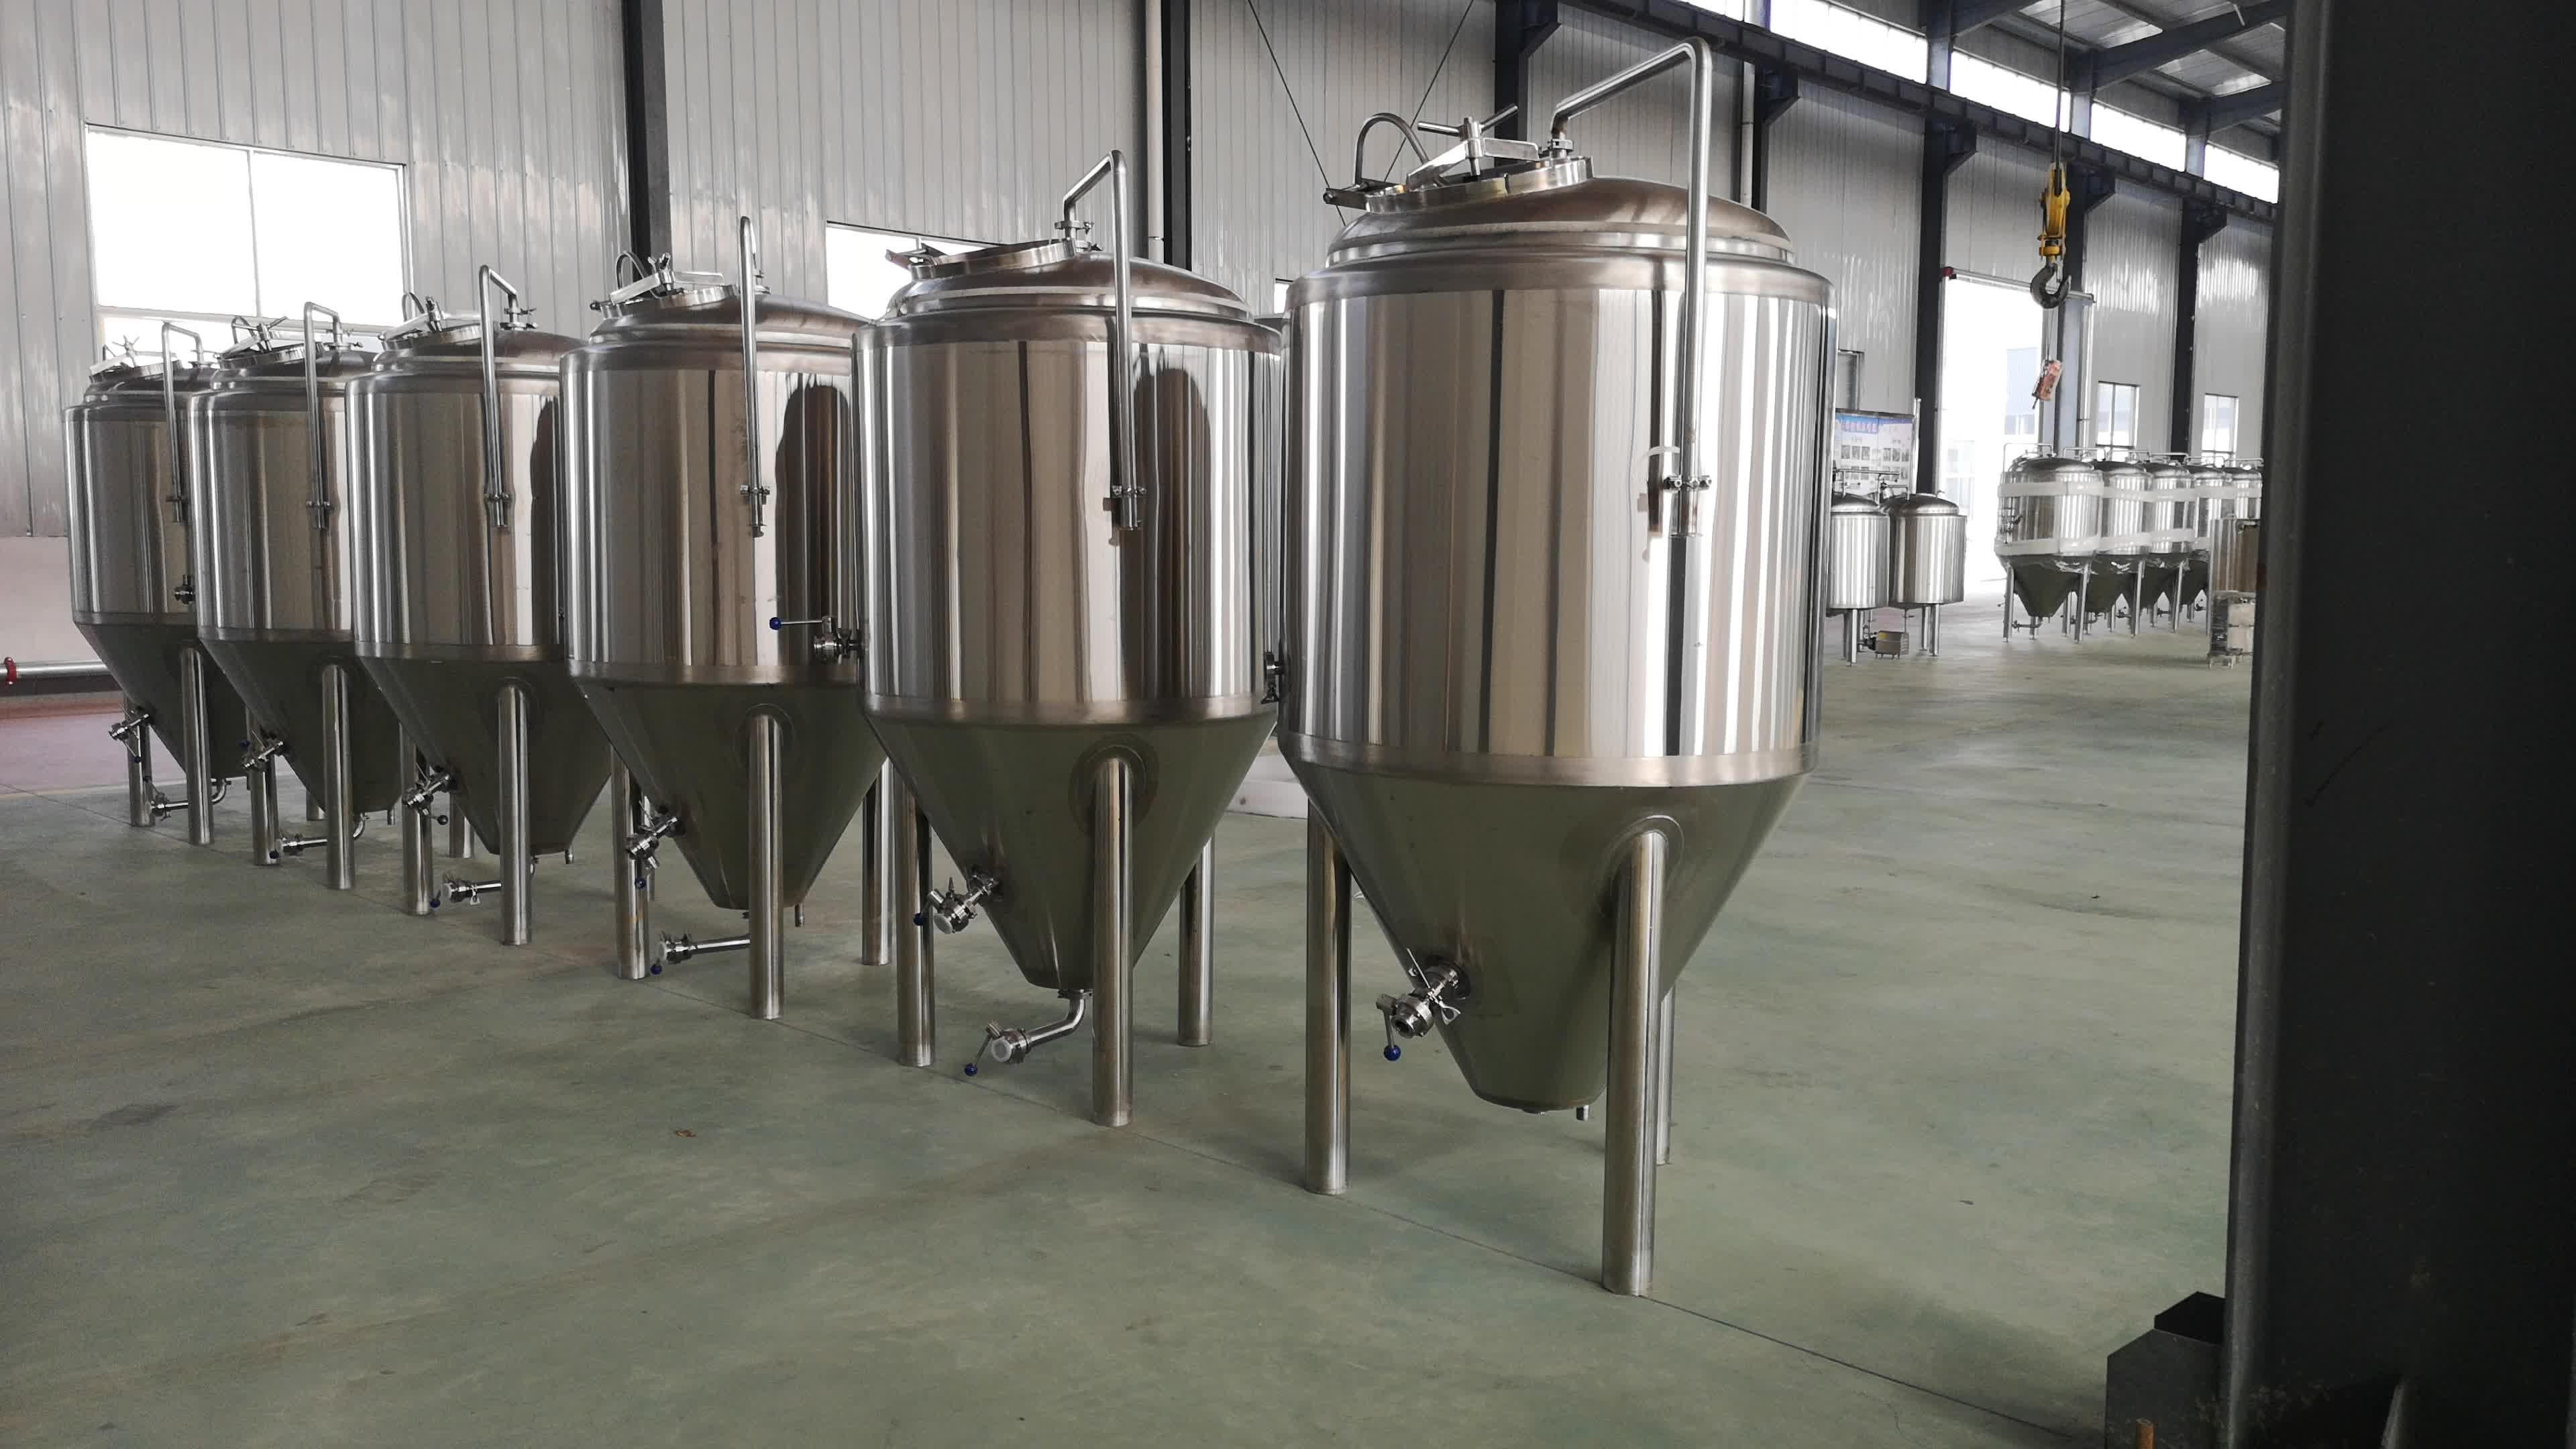 शिल्प बियर कारखाने उपयोग औद्योगिक किण्वन टैंक बड़े